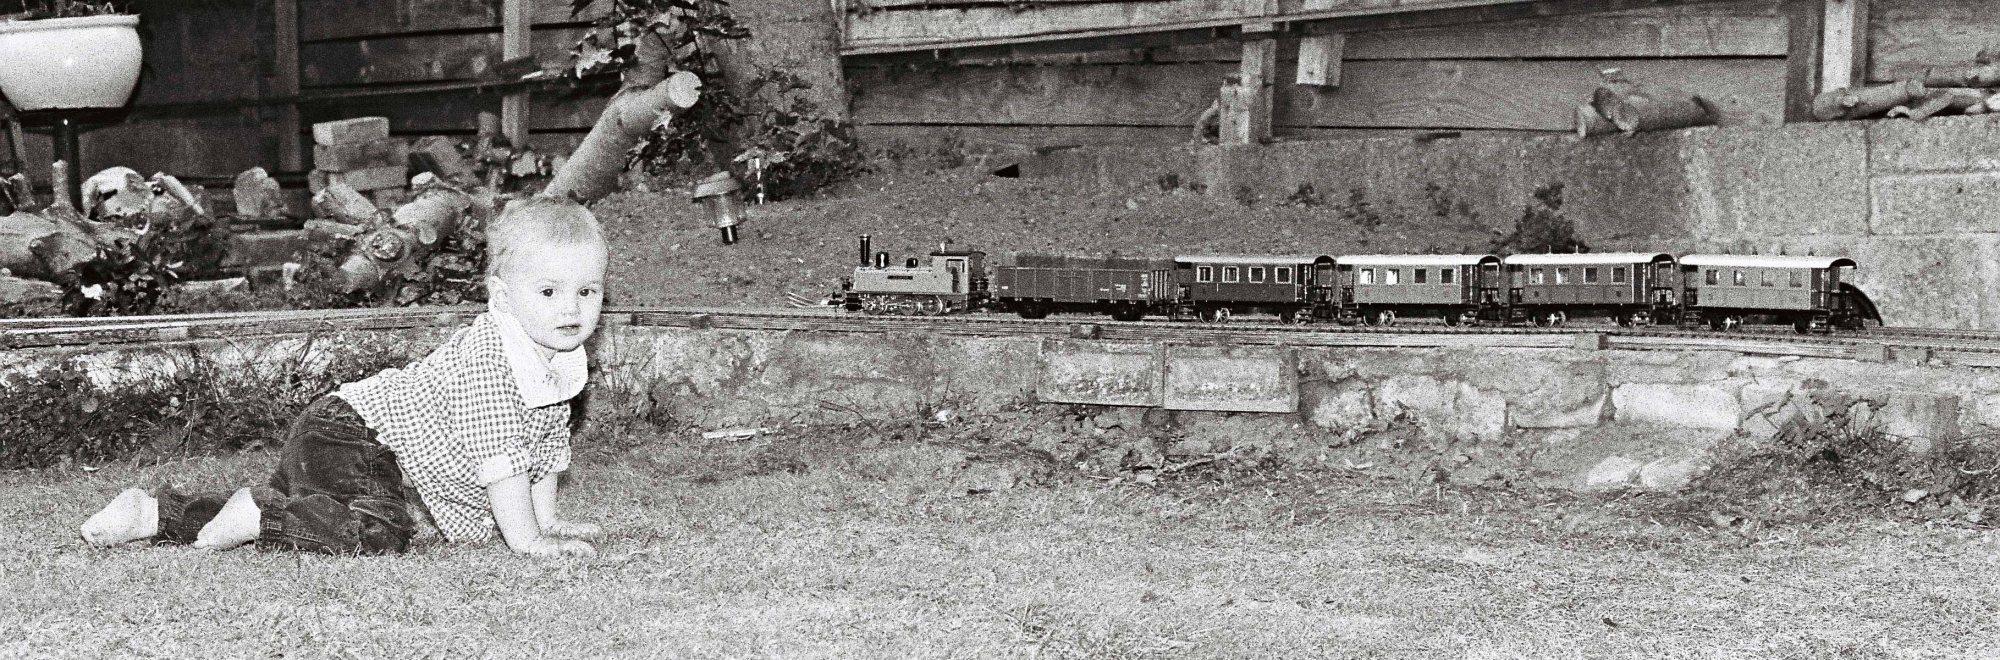 Carousel picture Kodak TRI-X 135MM